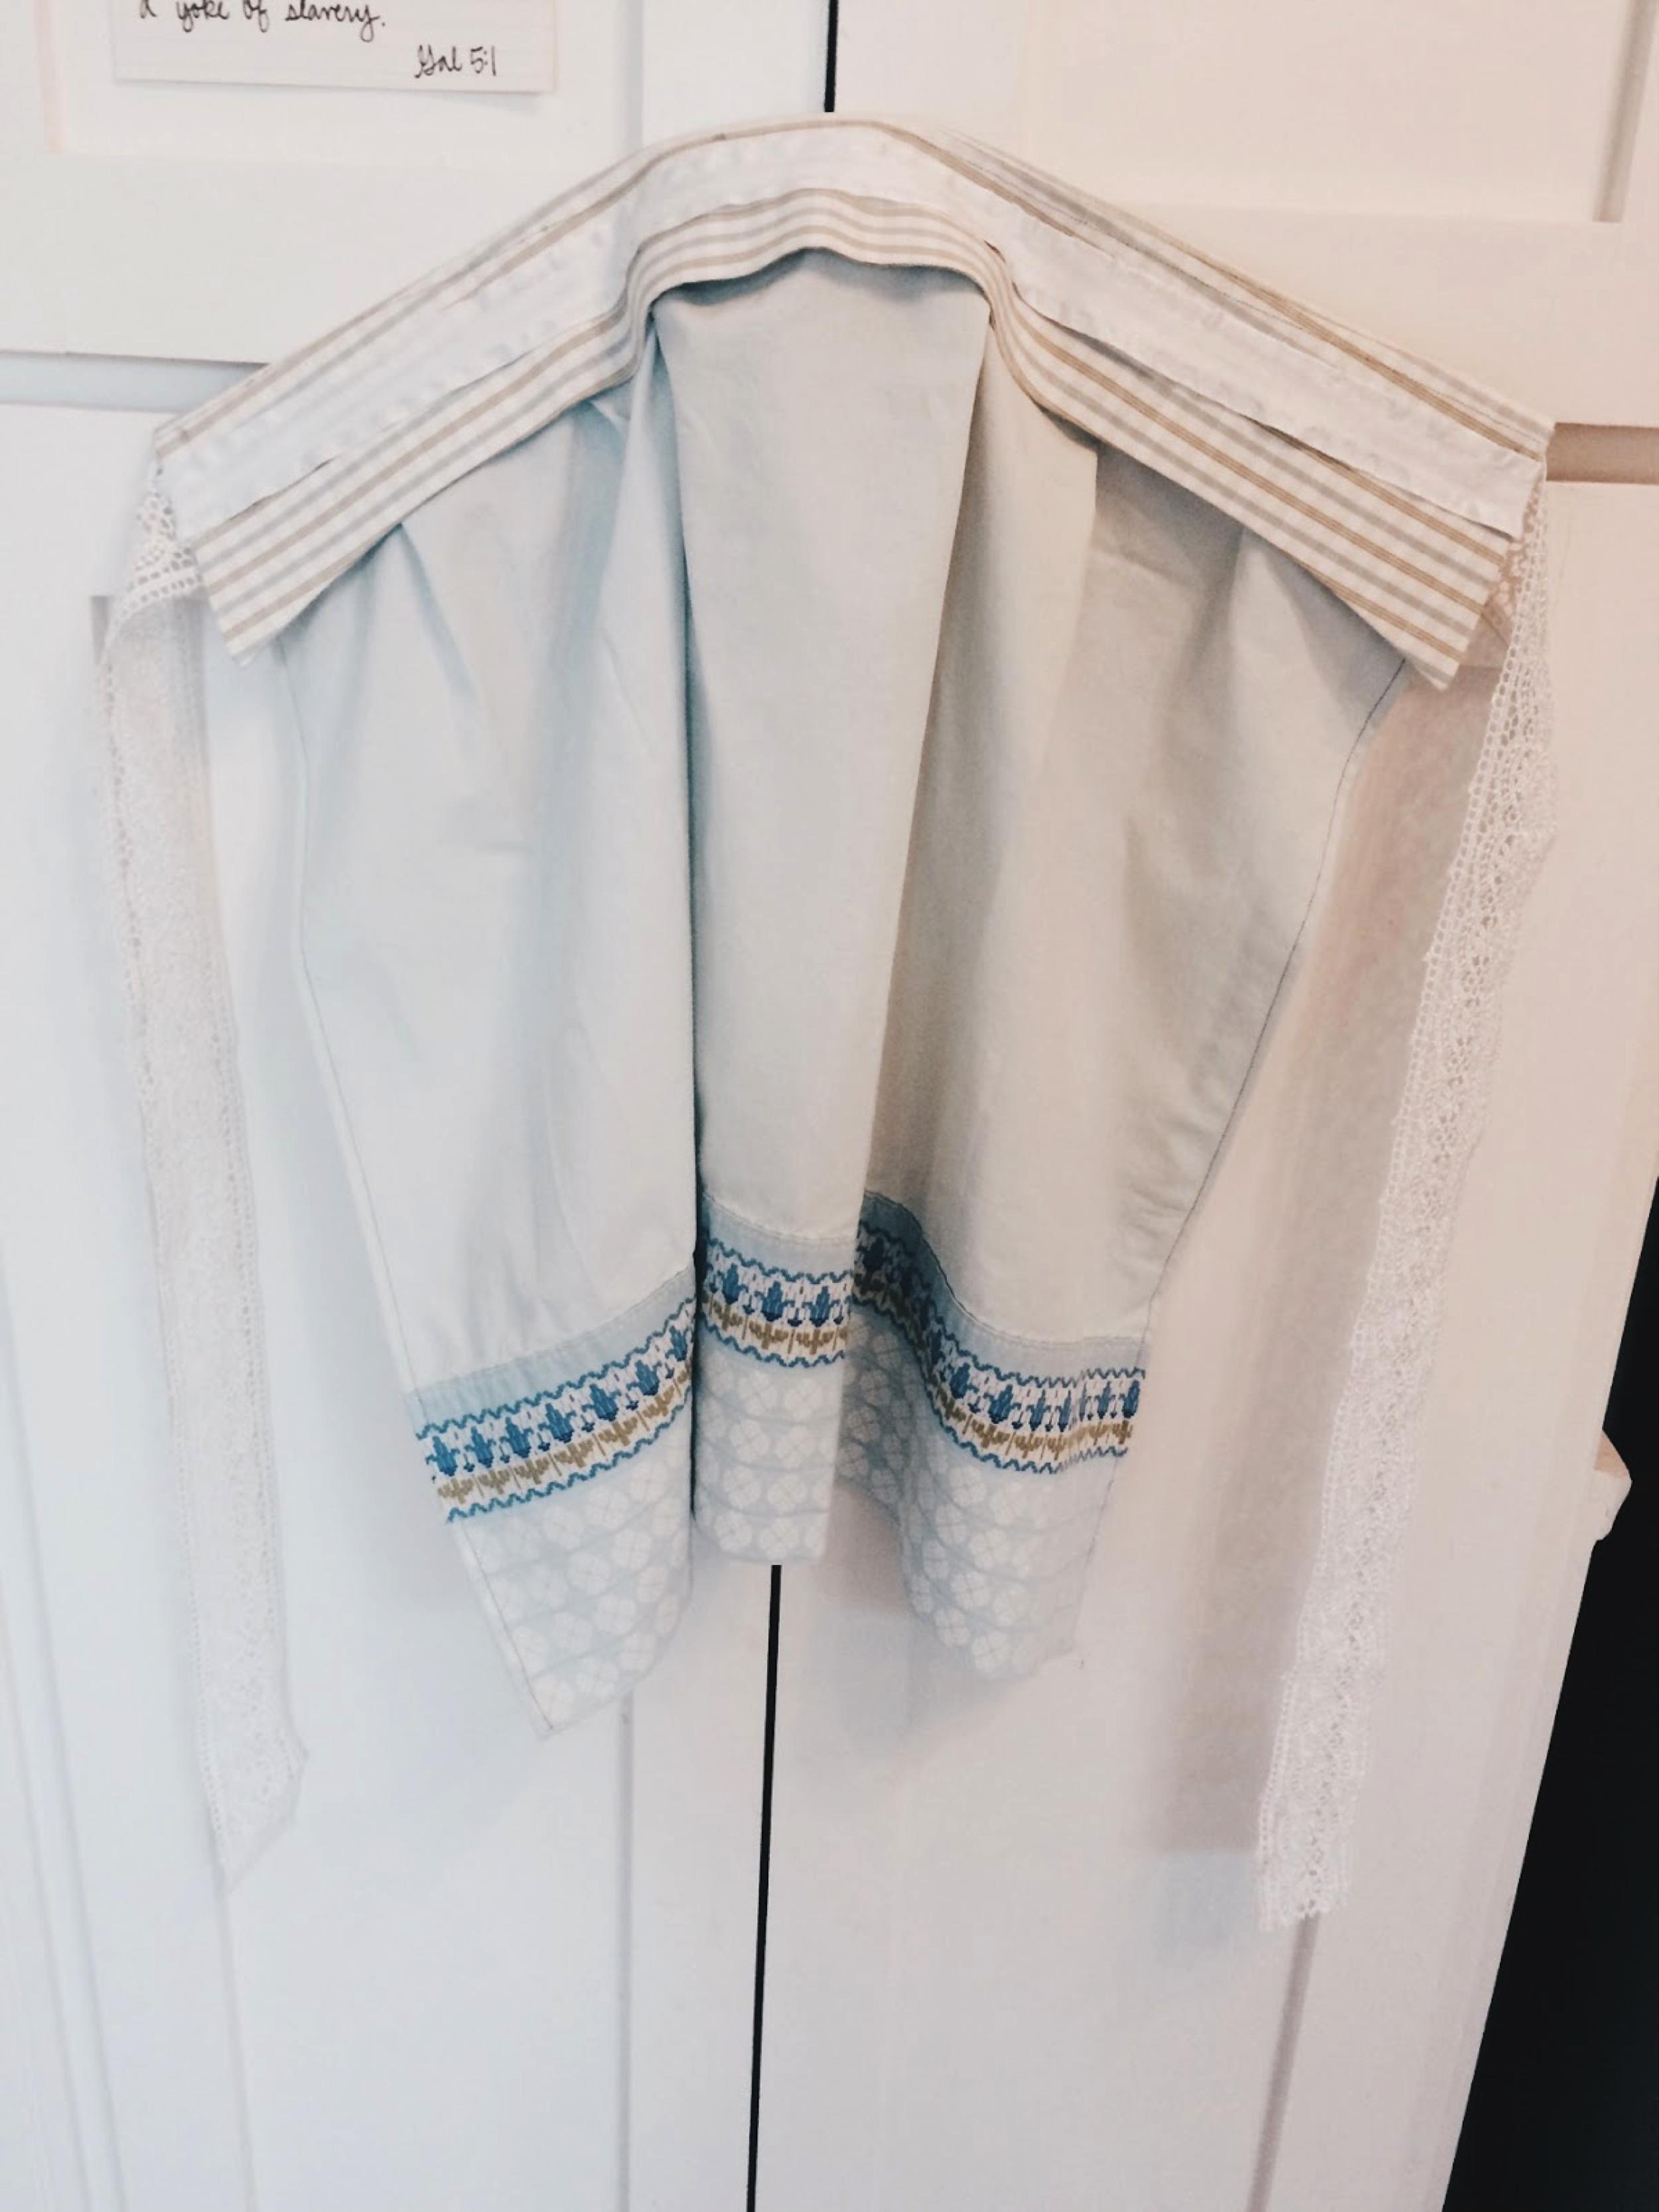 simple_sentimental_pillowcase_apron-6.jpeg